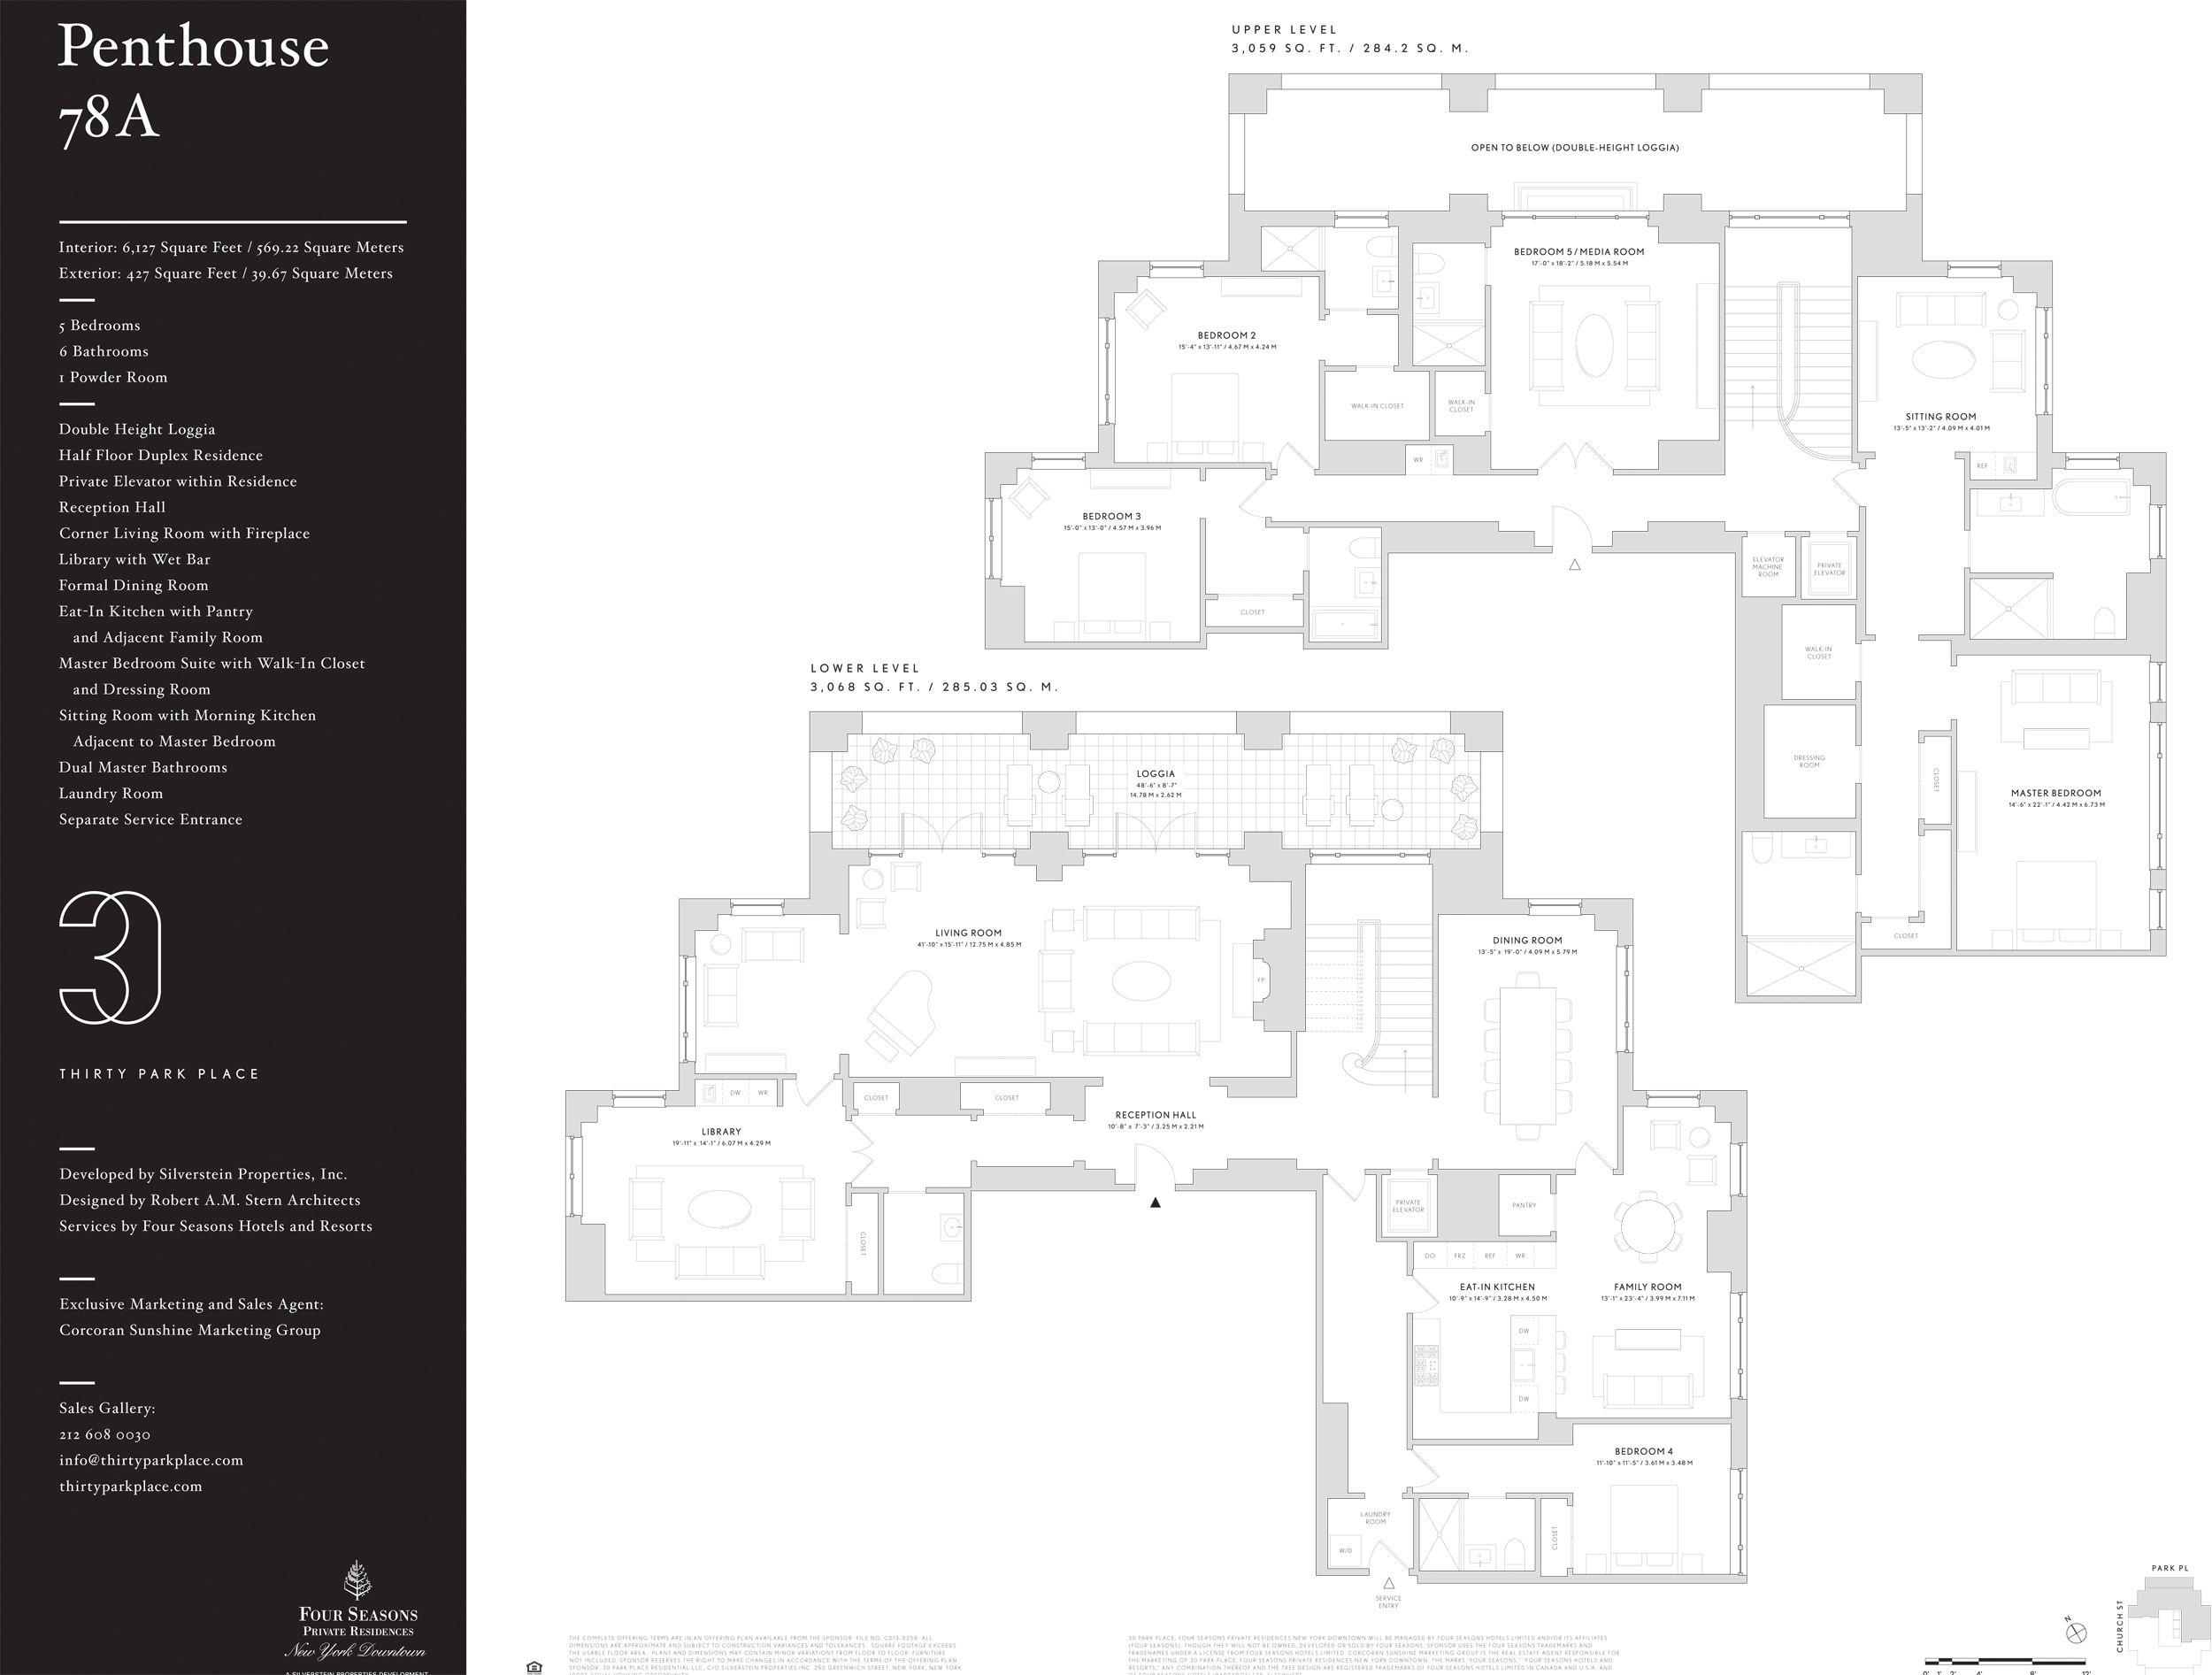 30 Park Place Reveals Sprawling New Penthouse